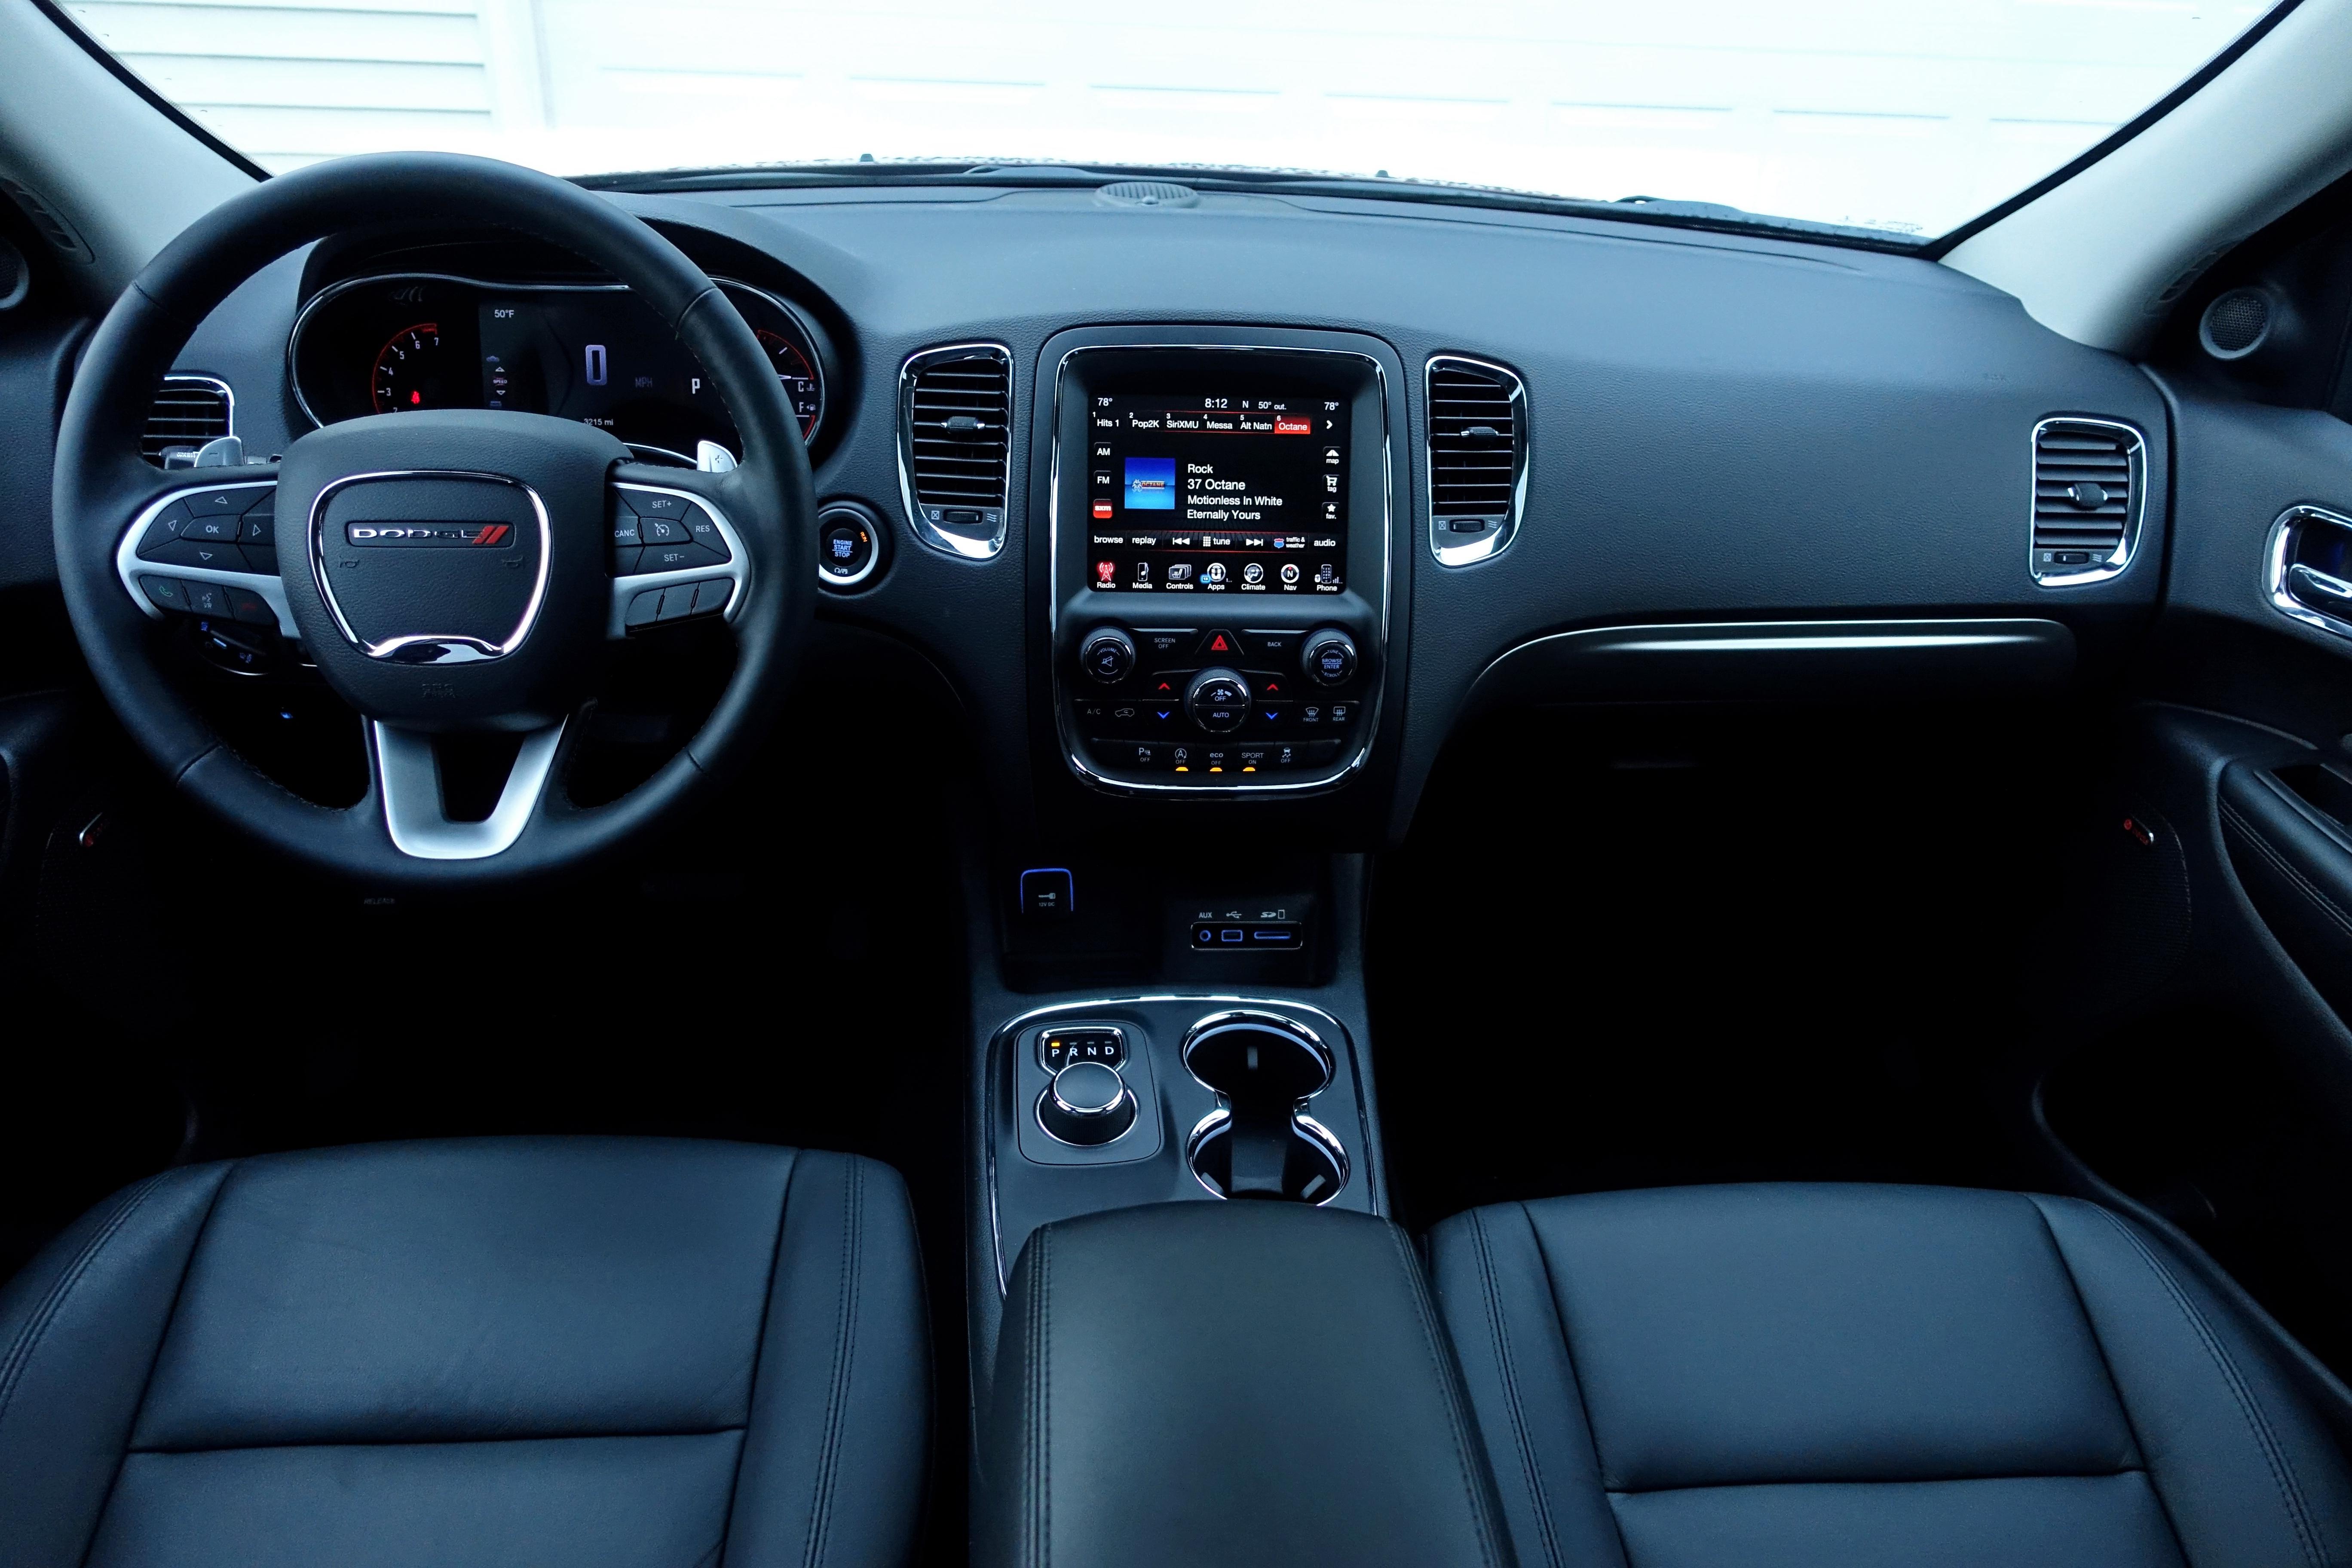 2017 Dodge Durango Rt Interior